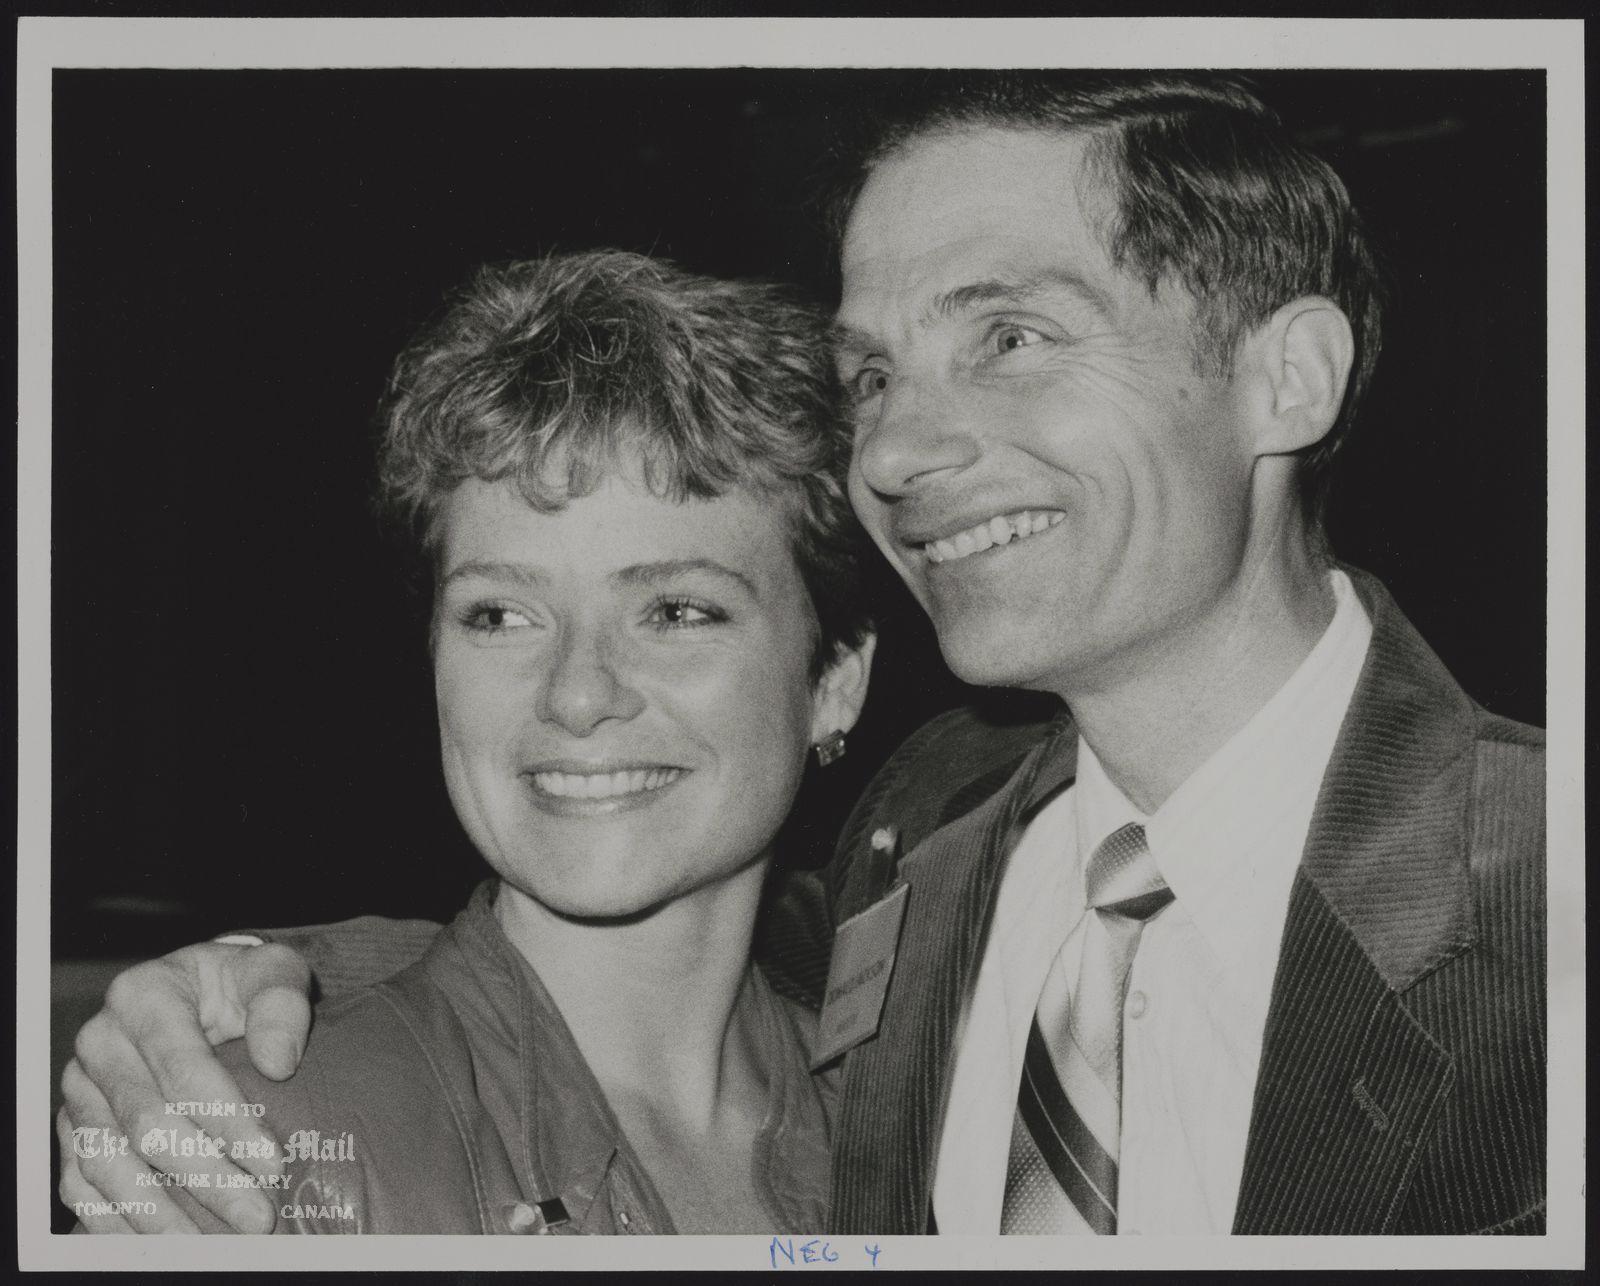 BARBARA UNDERHILL Figure skater Barbara Underhill with Donald Jackson.